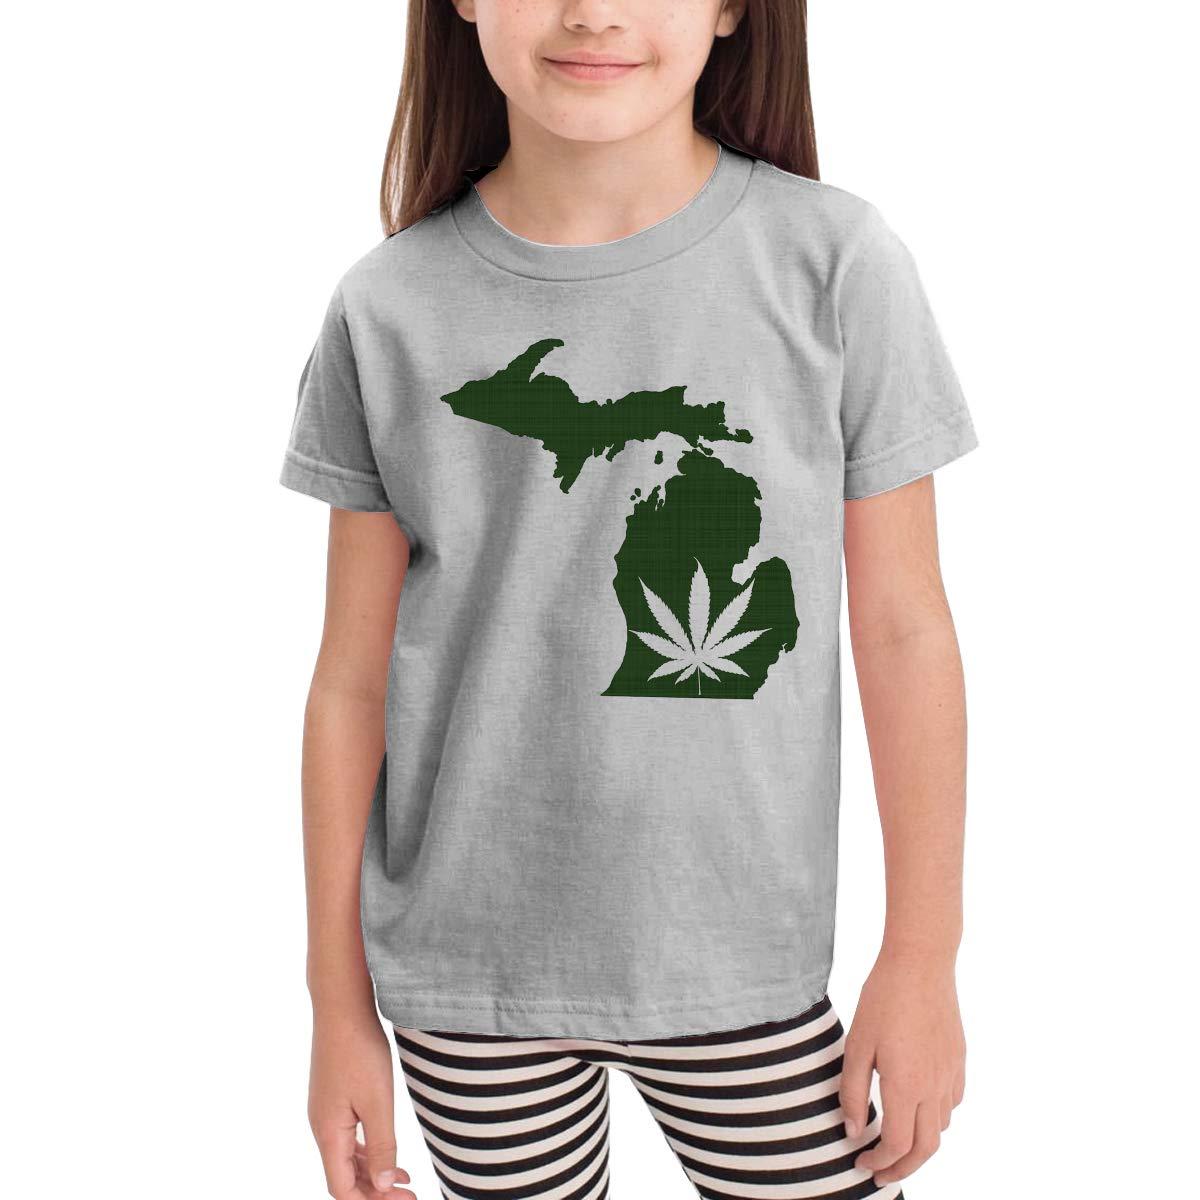 Marijuana Leaf Michigan Leaf Michigan 100/% Cotton Toddler Baby Boys Girls Kids Short Sleeve T Shirt Top Tee Clothes 2-6 T